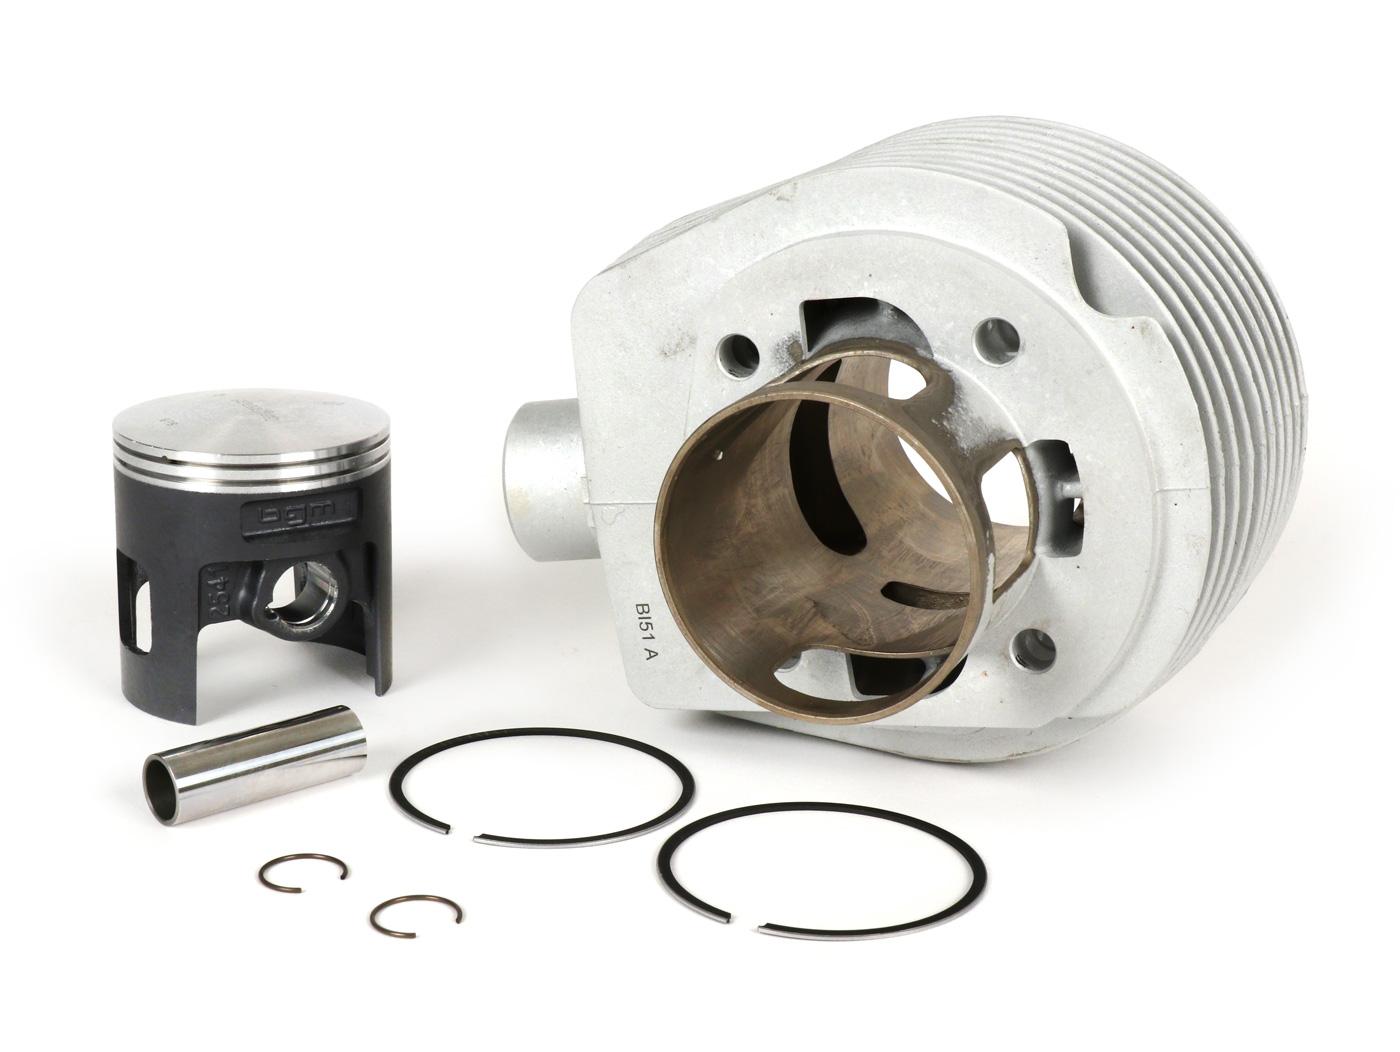 Cylinder Piston Ring Head Stud Spares Vespa PX LML Stella 5 port 150 cc Genuine